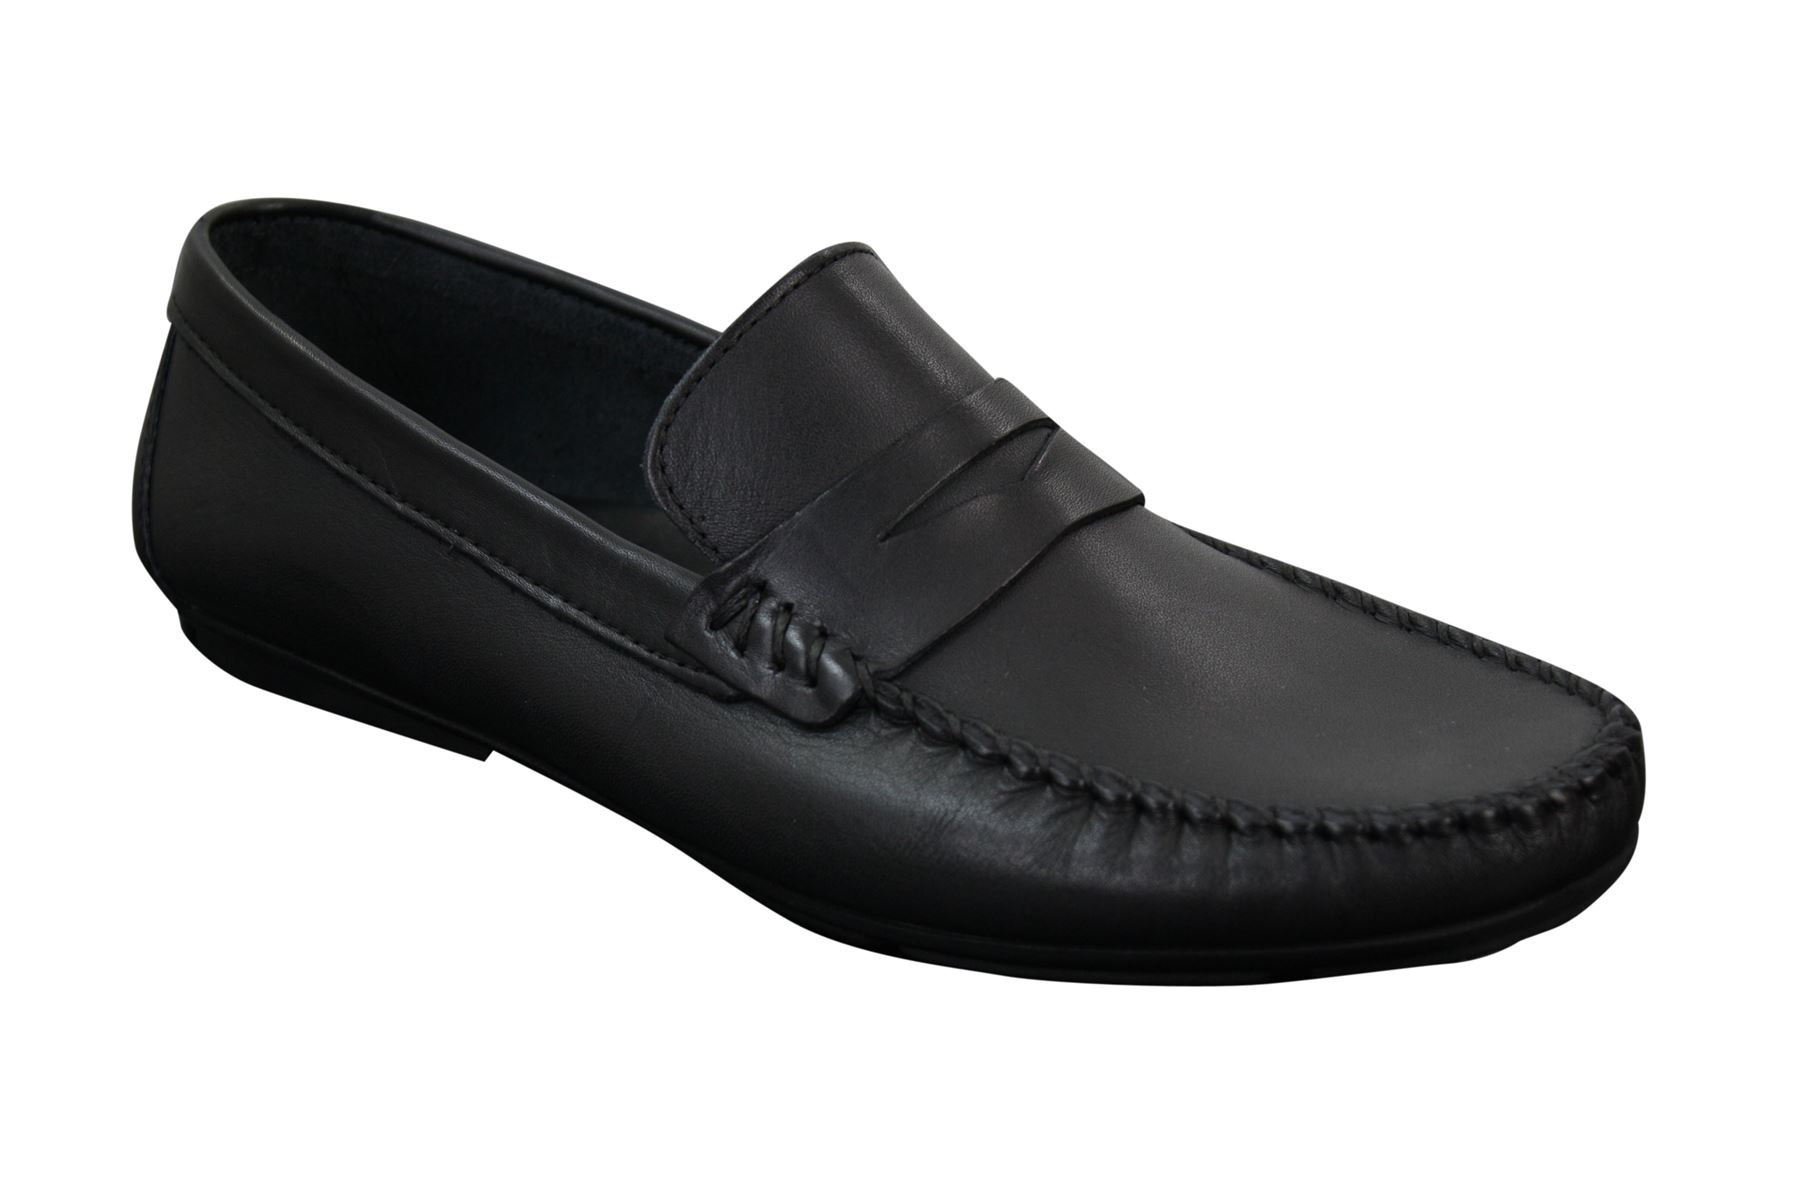 Zapatos cuero caballero zapatos cuero Zapatos genuino vintage negro retro slip on Design dc7e38